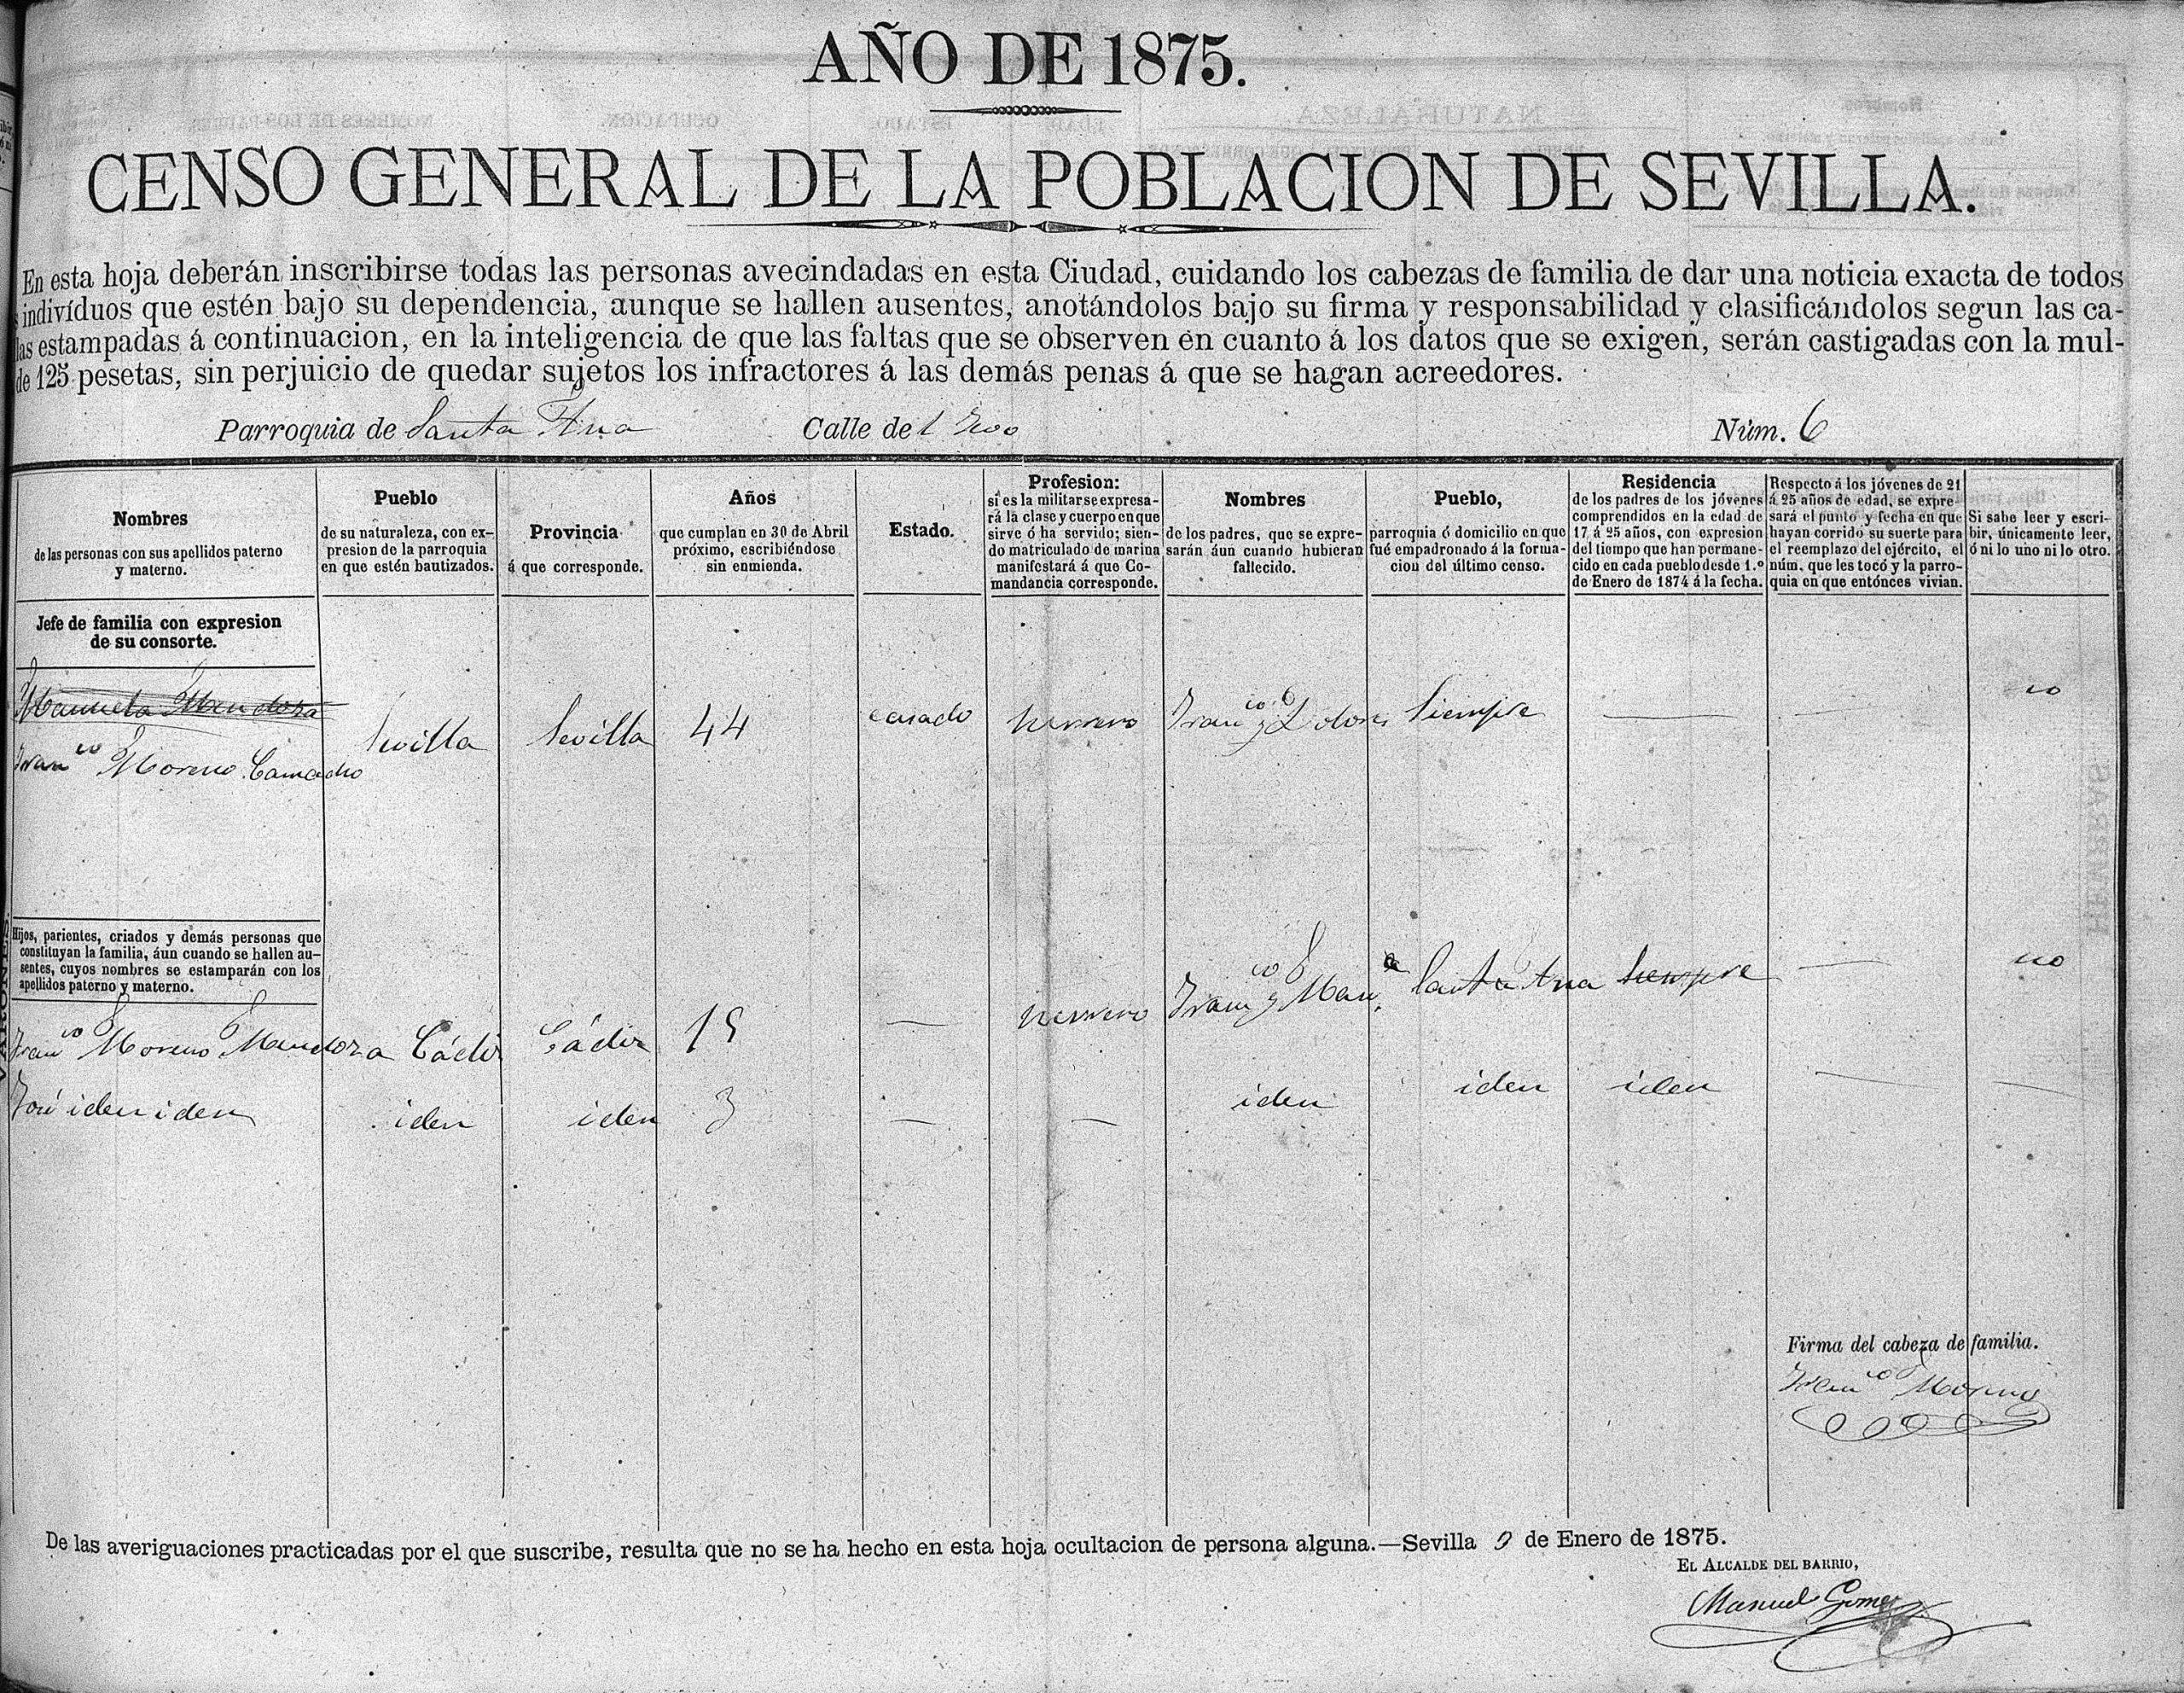 Padrón de Francisco La Perla. Sevilla, 1875. Archivo Manuel Bohórquez.